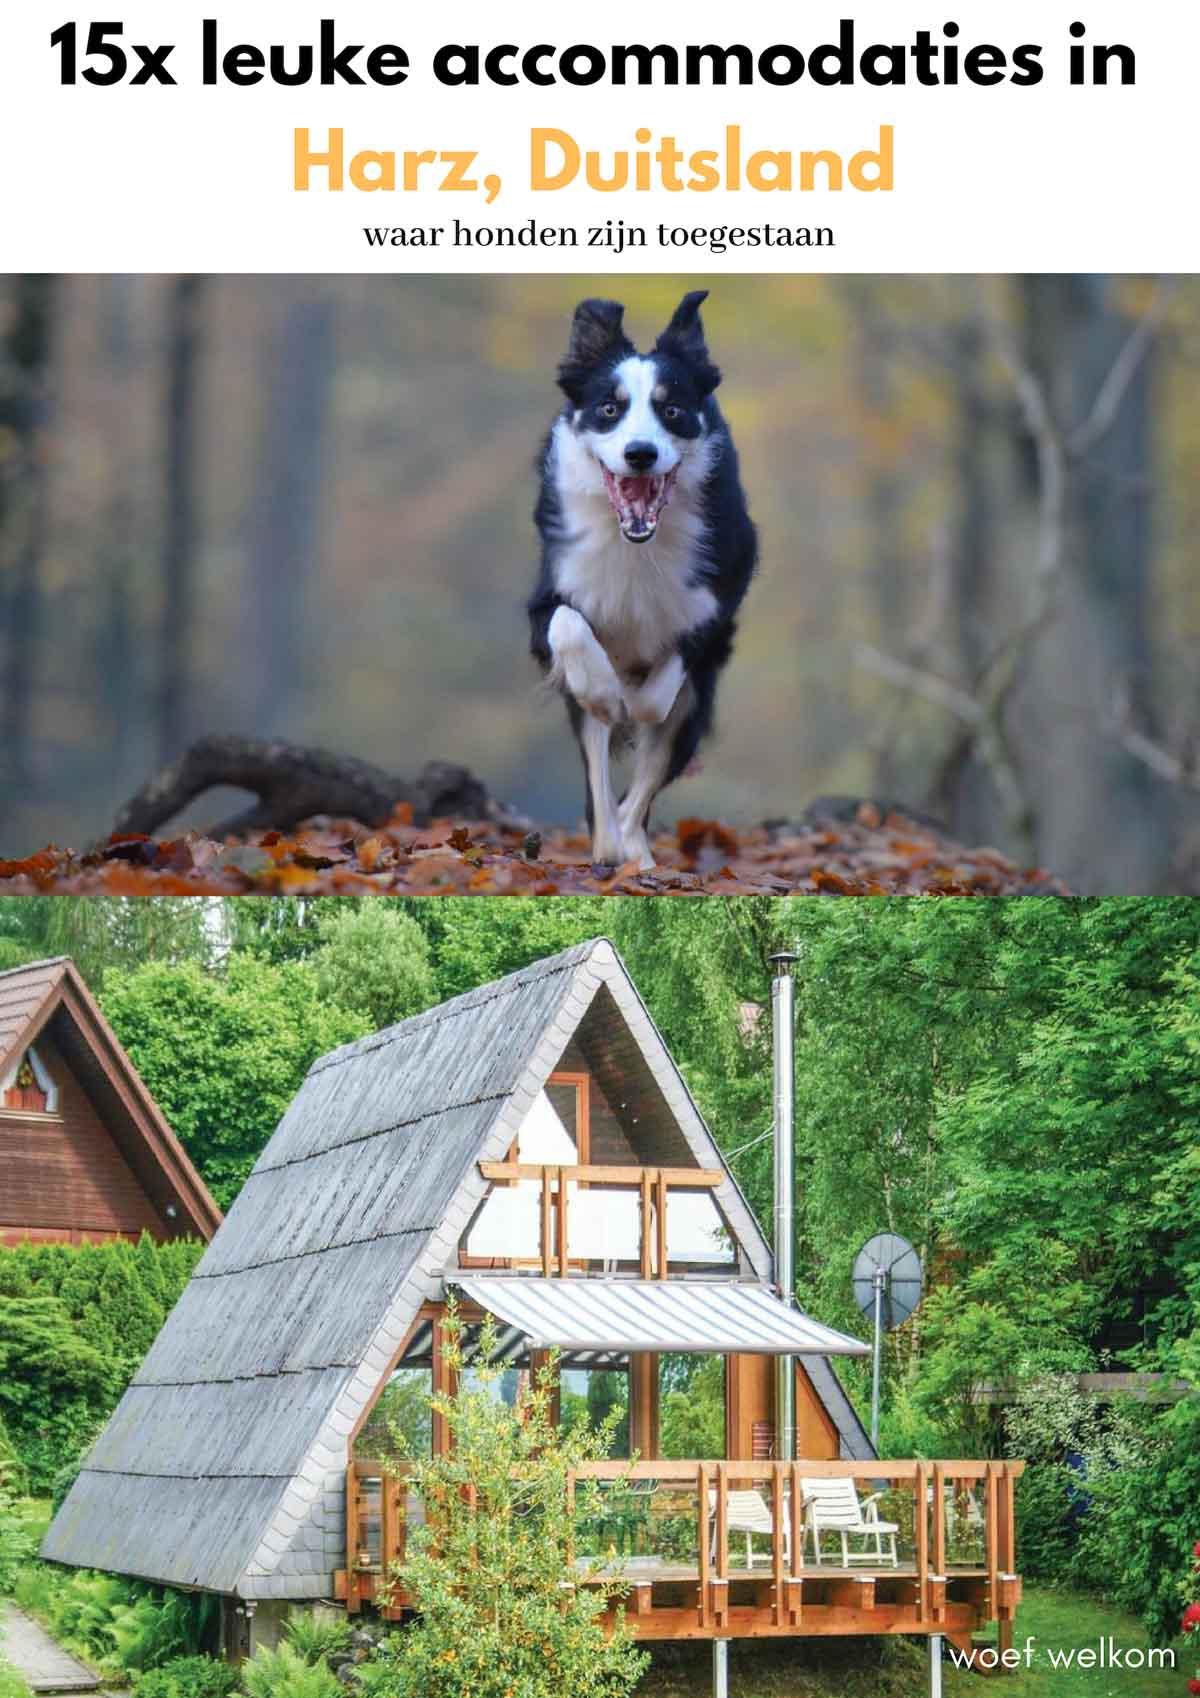 15x leuke accommodaties in Harz met je hond - Woef Welkom